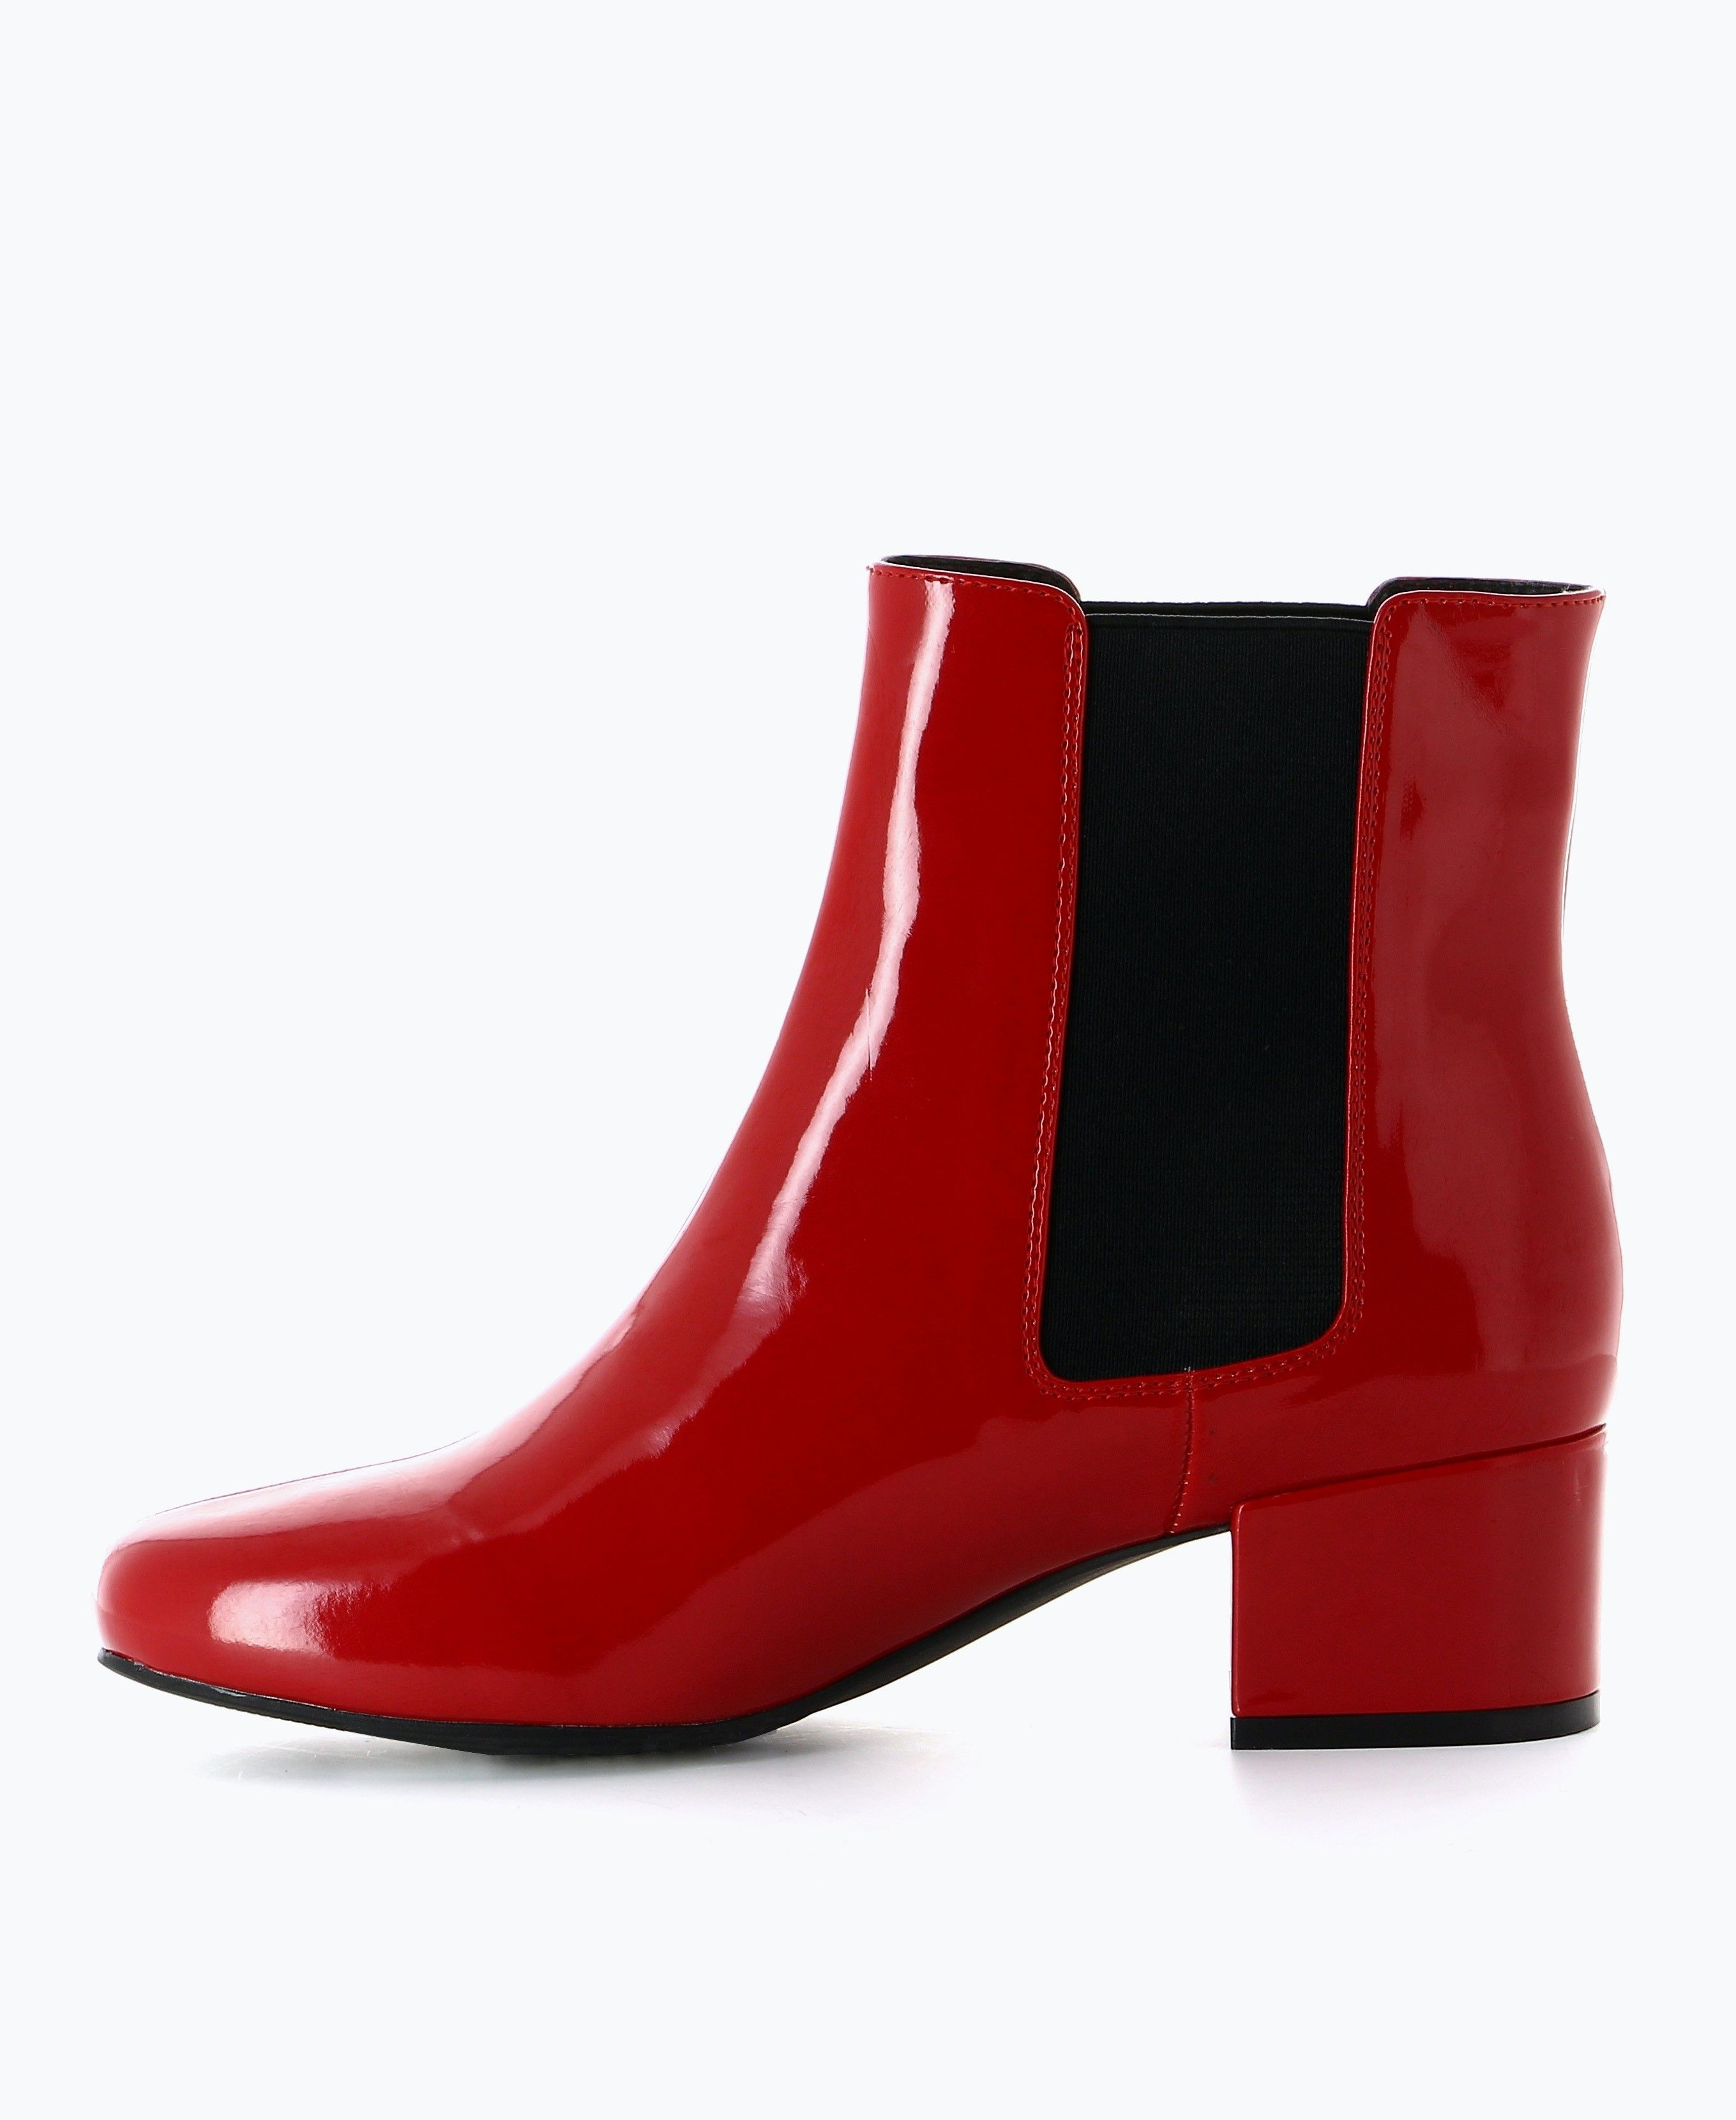 f3392b61e8c8ea Boots sixties - Boots - Catégories - FEMME | Texto Texto Chaussures, Vente  De Chaussures